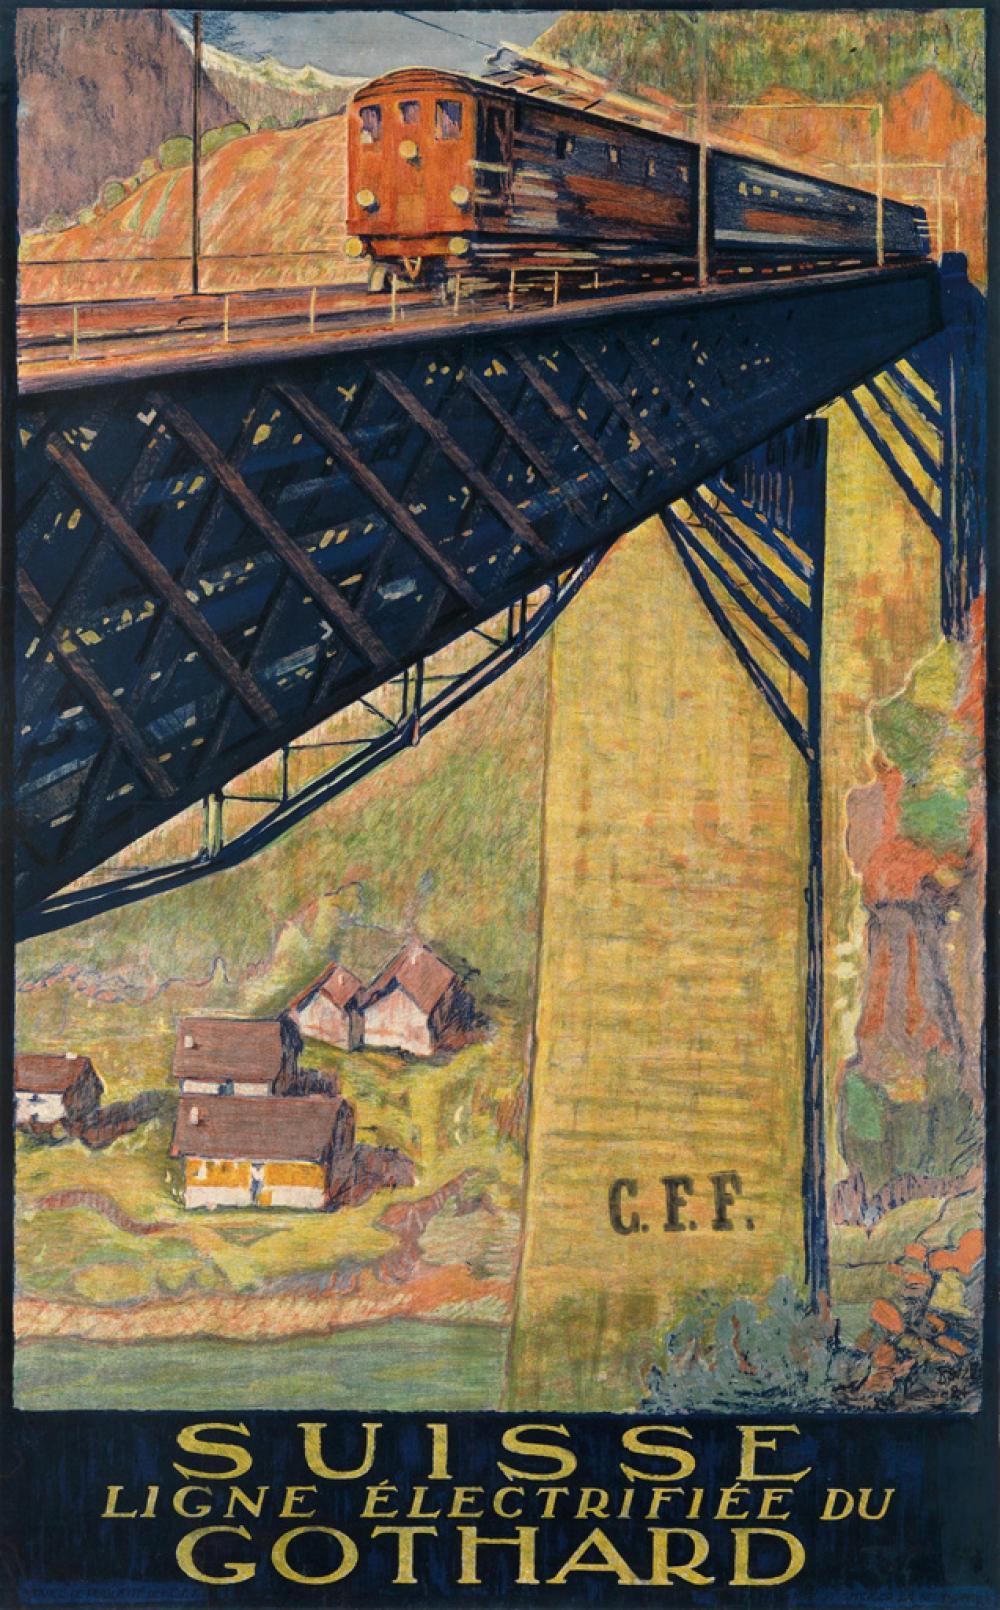 DANIELE BUZZI (1890-1974). SUISSE / GOTHARD. 1924. 39x24 inches, 99x62 cm. P. Attinger, Neuchatel.